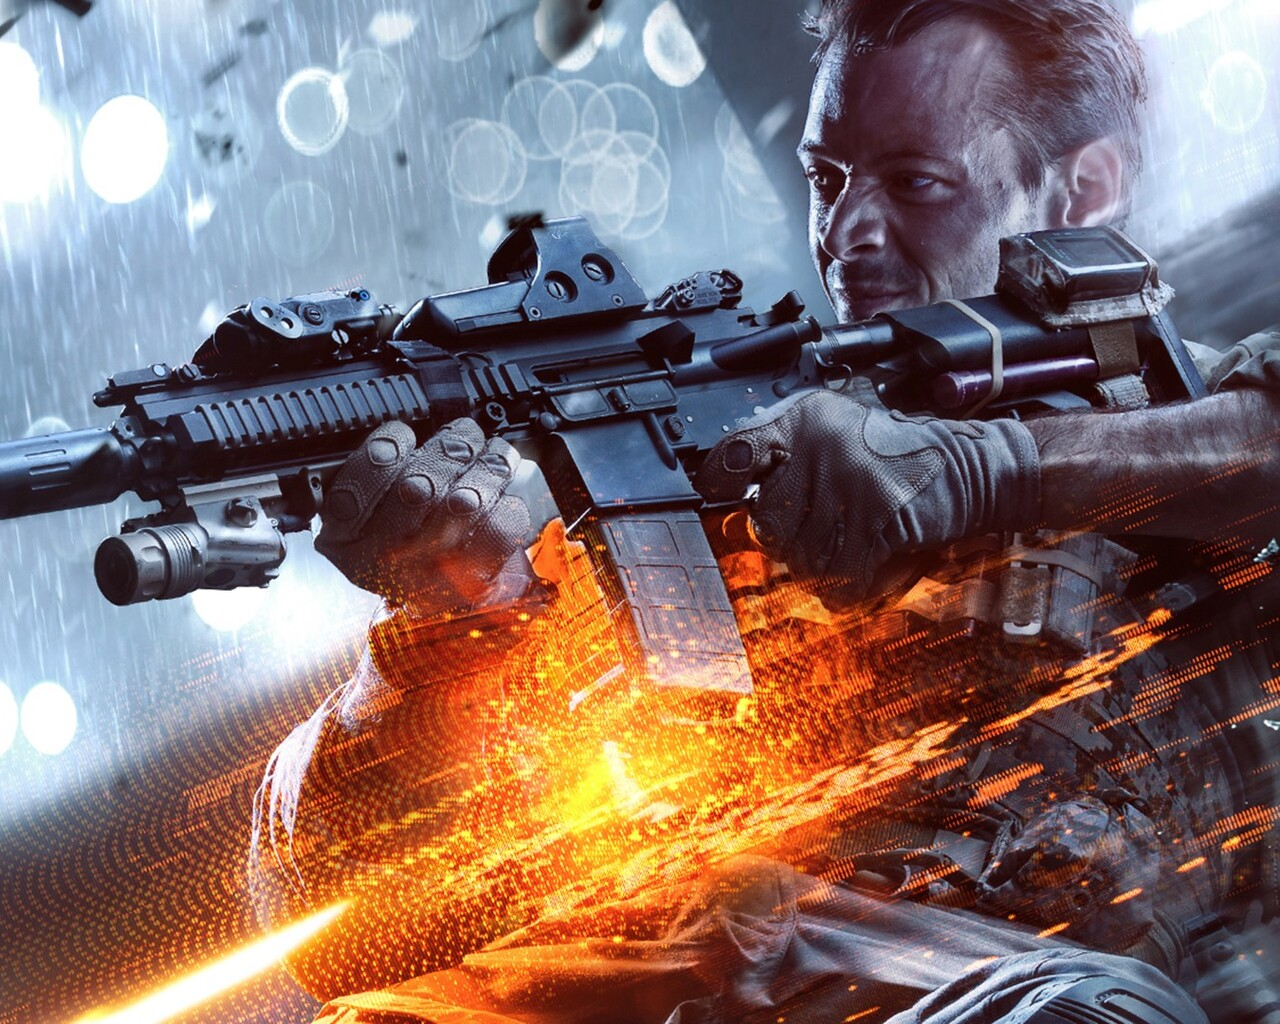 Download Wallpaper 1280x1280 Battlefield 4 Game Ea: 1280x1024 Battlefield 4 Pc Game 1280x1024 Resolution HD 4k